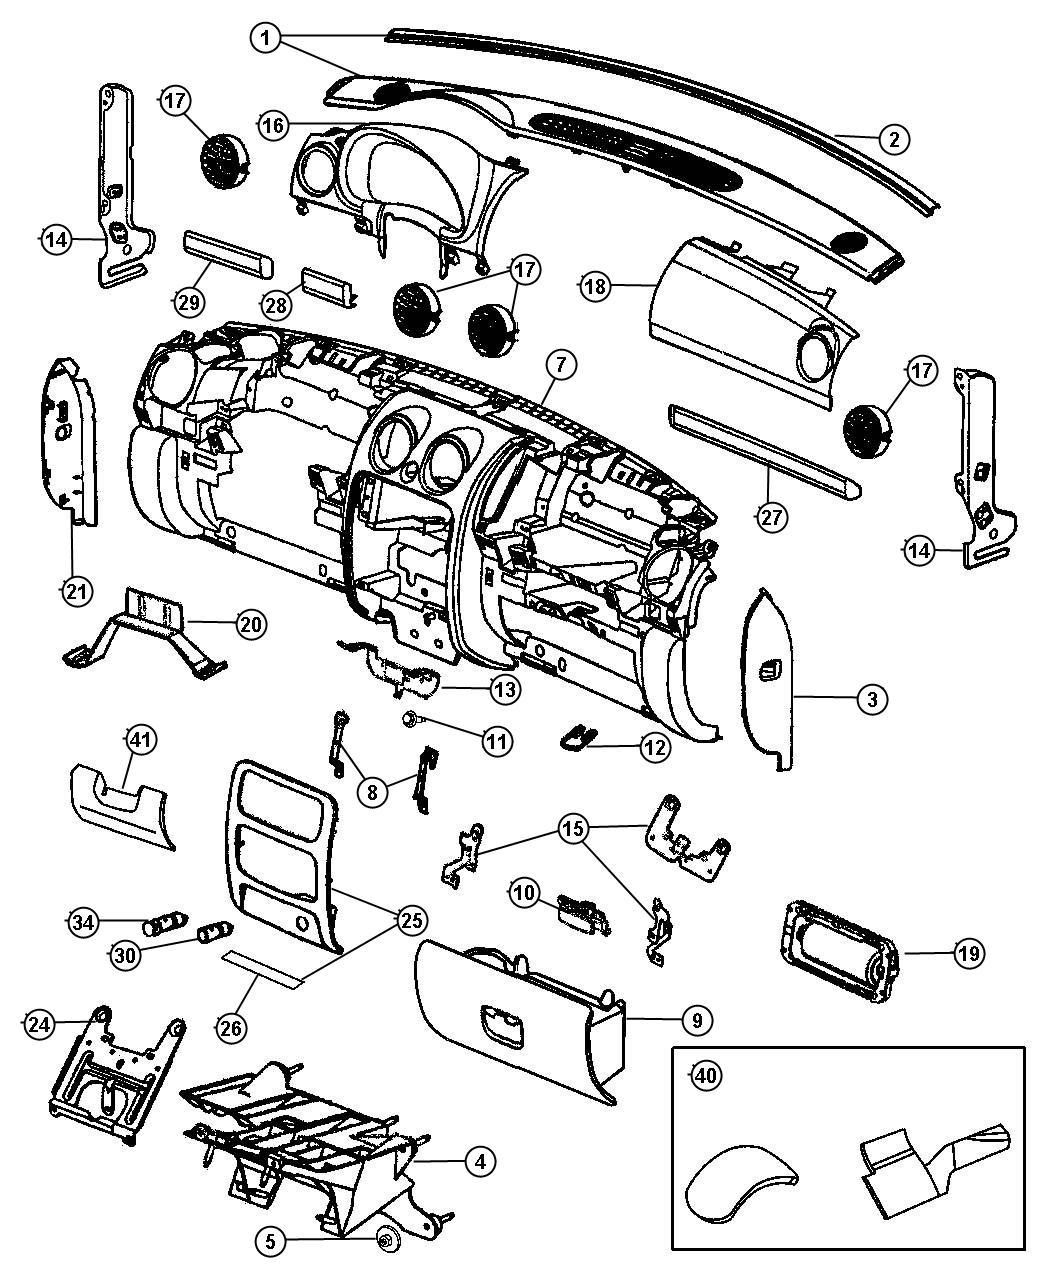 Dodge Dart Glove box. Instrument panel. [d5, db], [d5